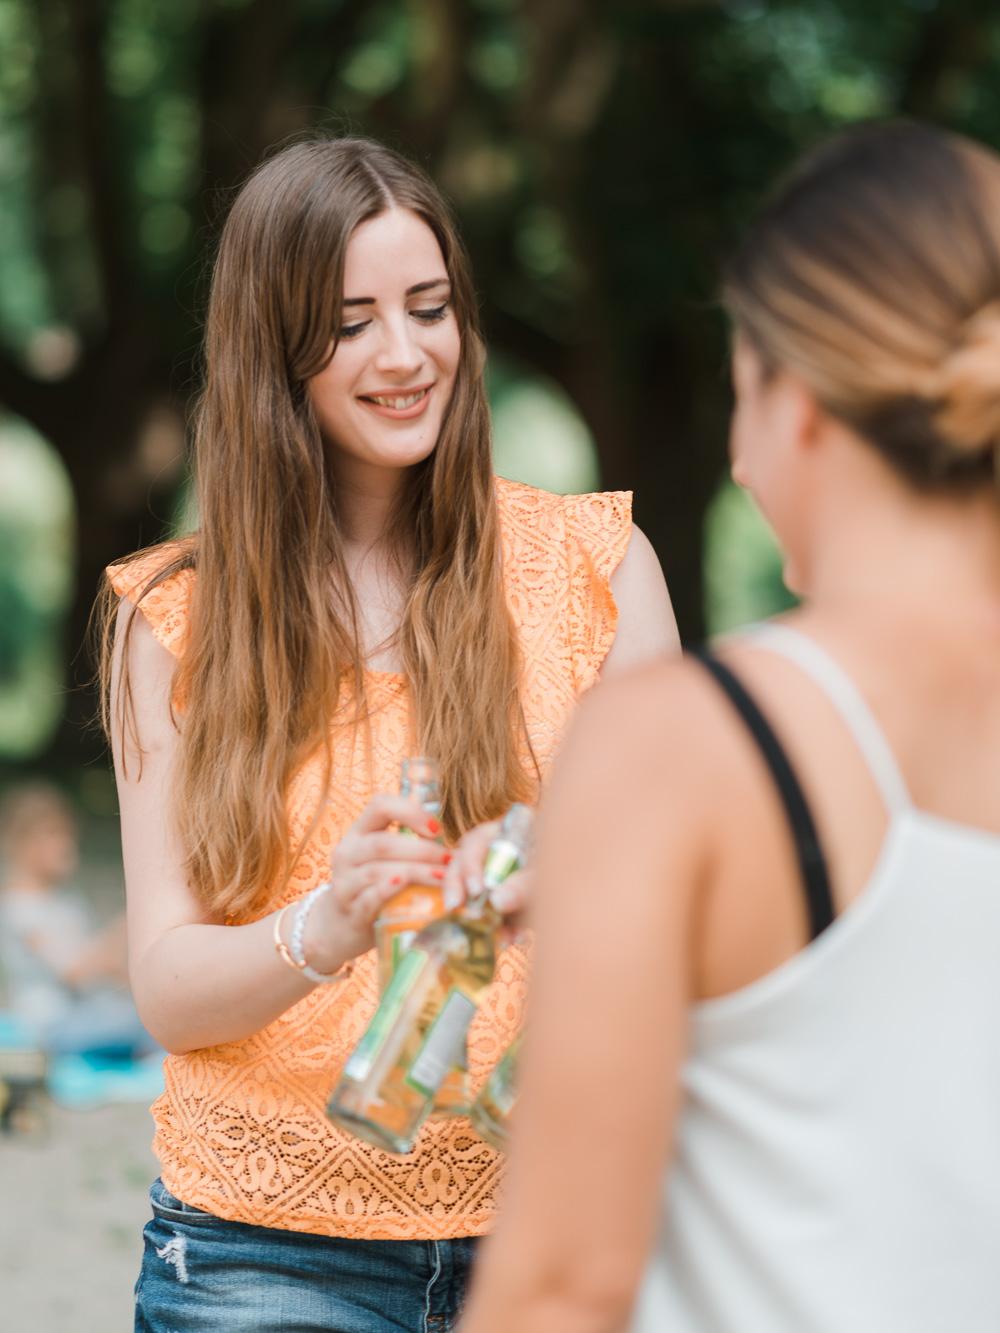 frisbee-party-saarbruecken-gruendels-alkoholfrei